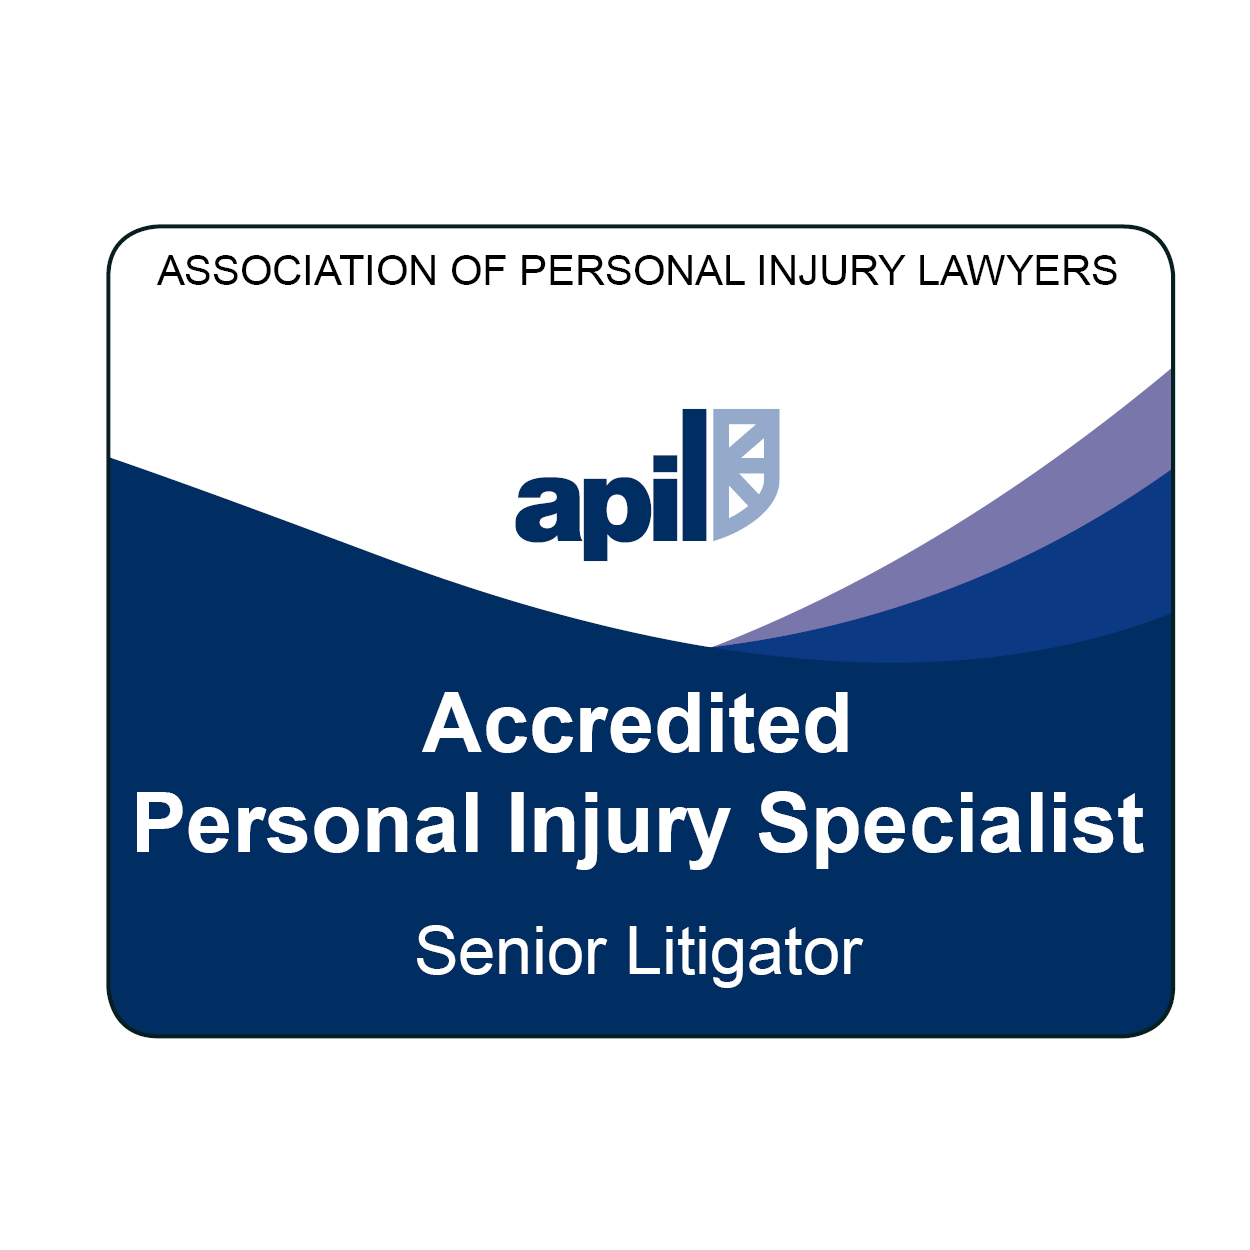 Senior Litigator